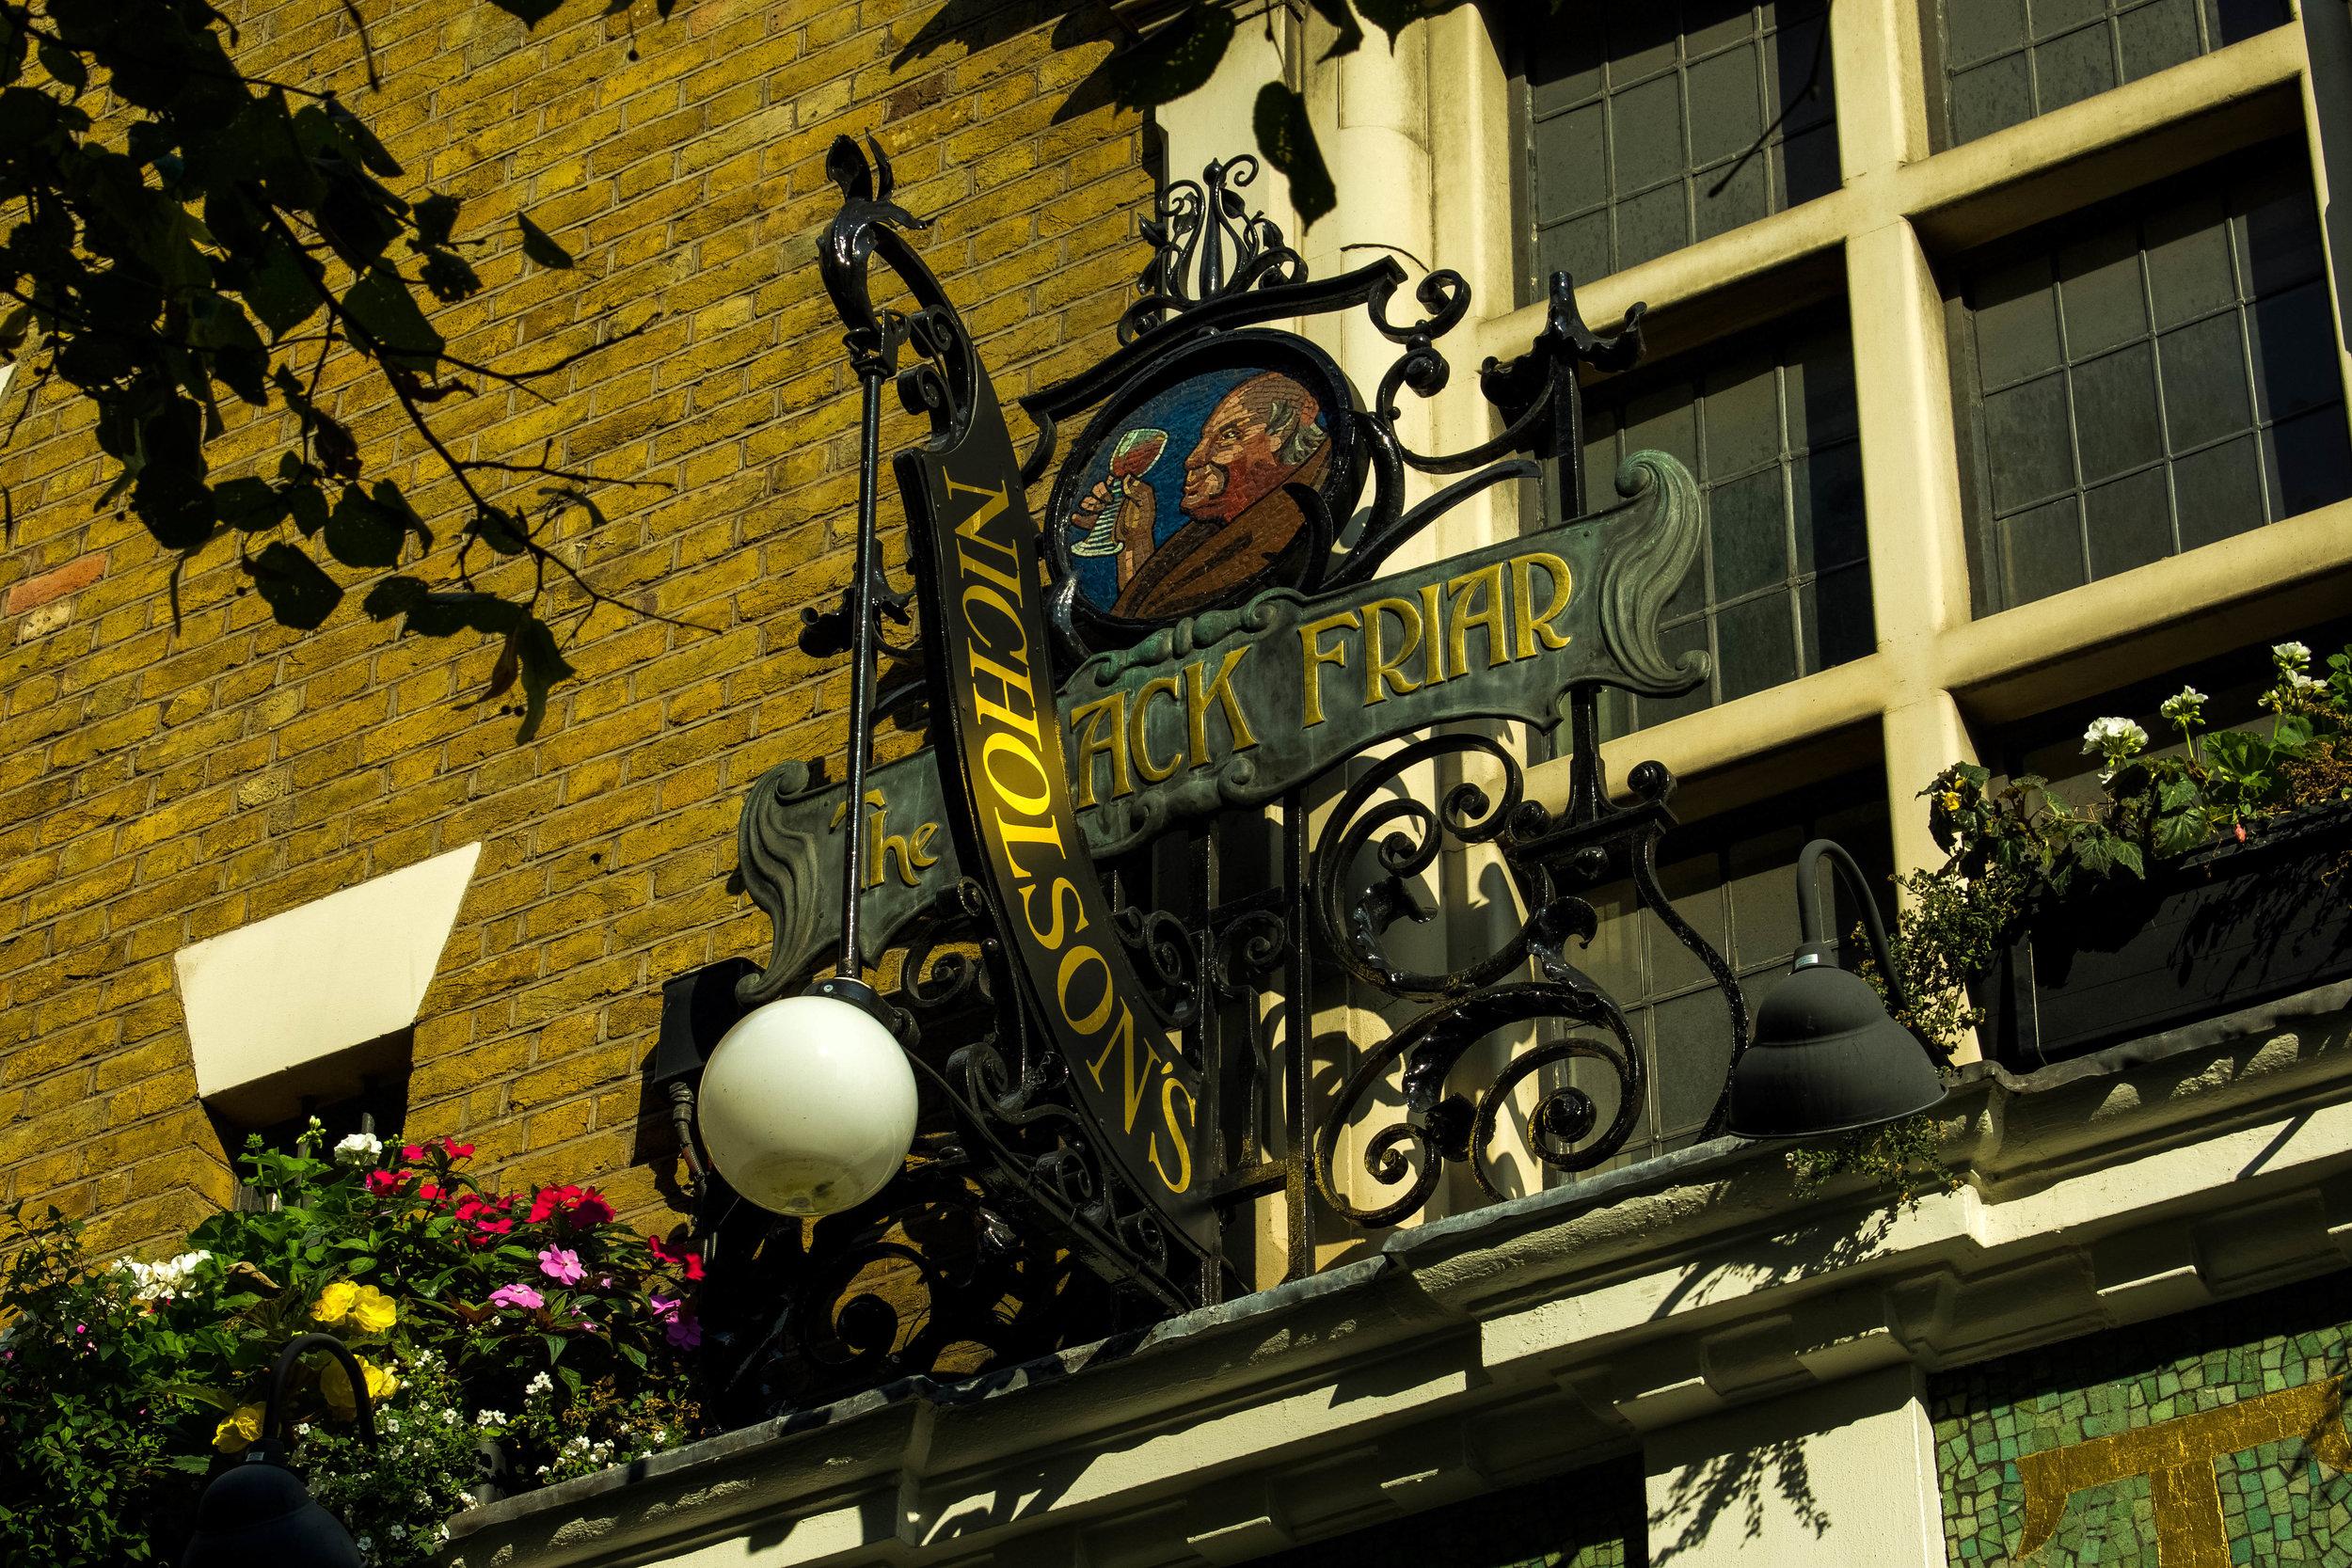 The Blackfriar ~ London